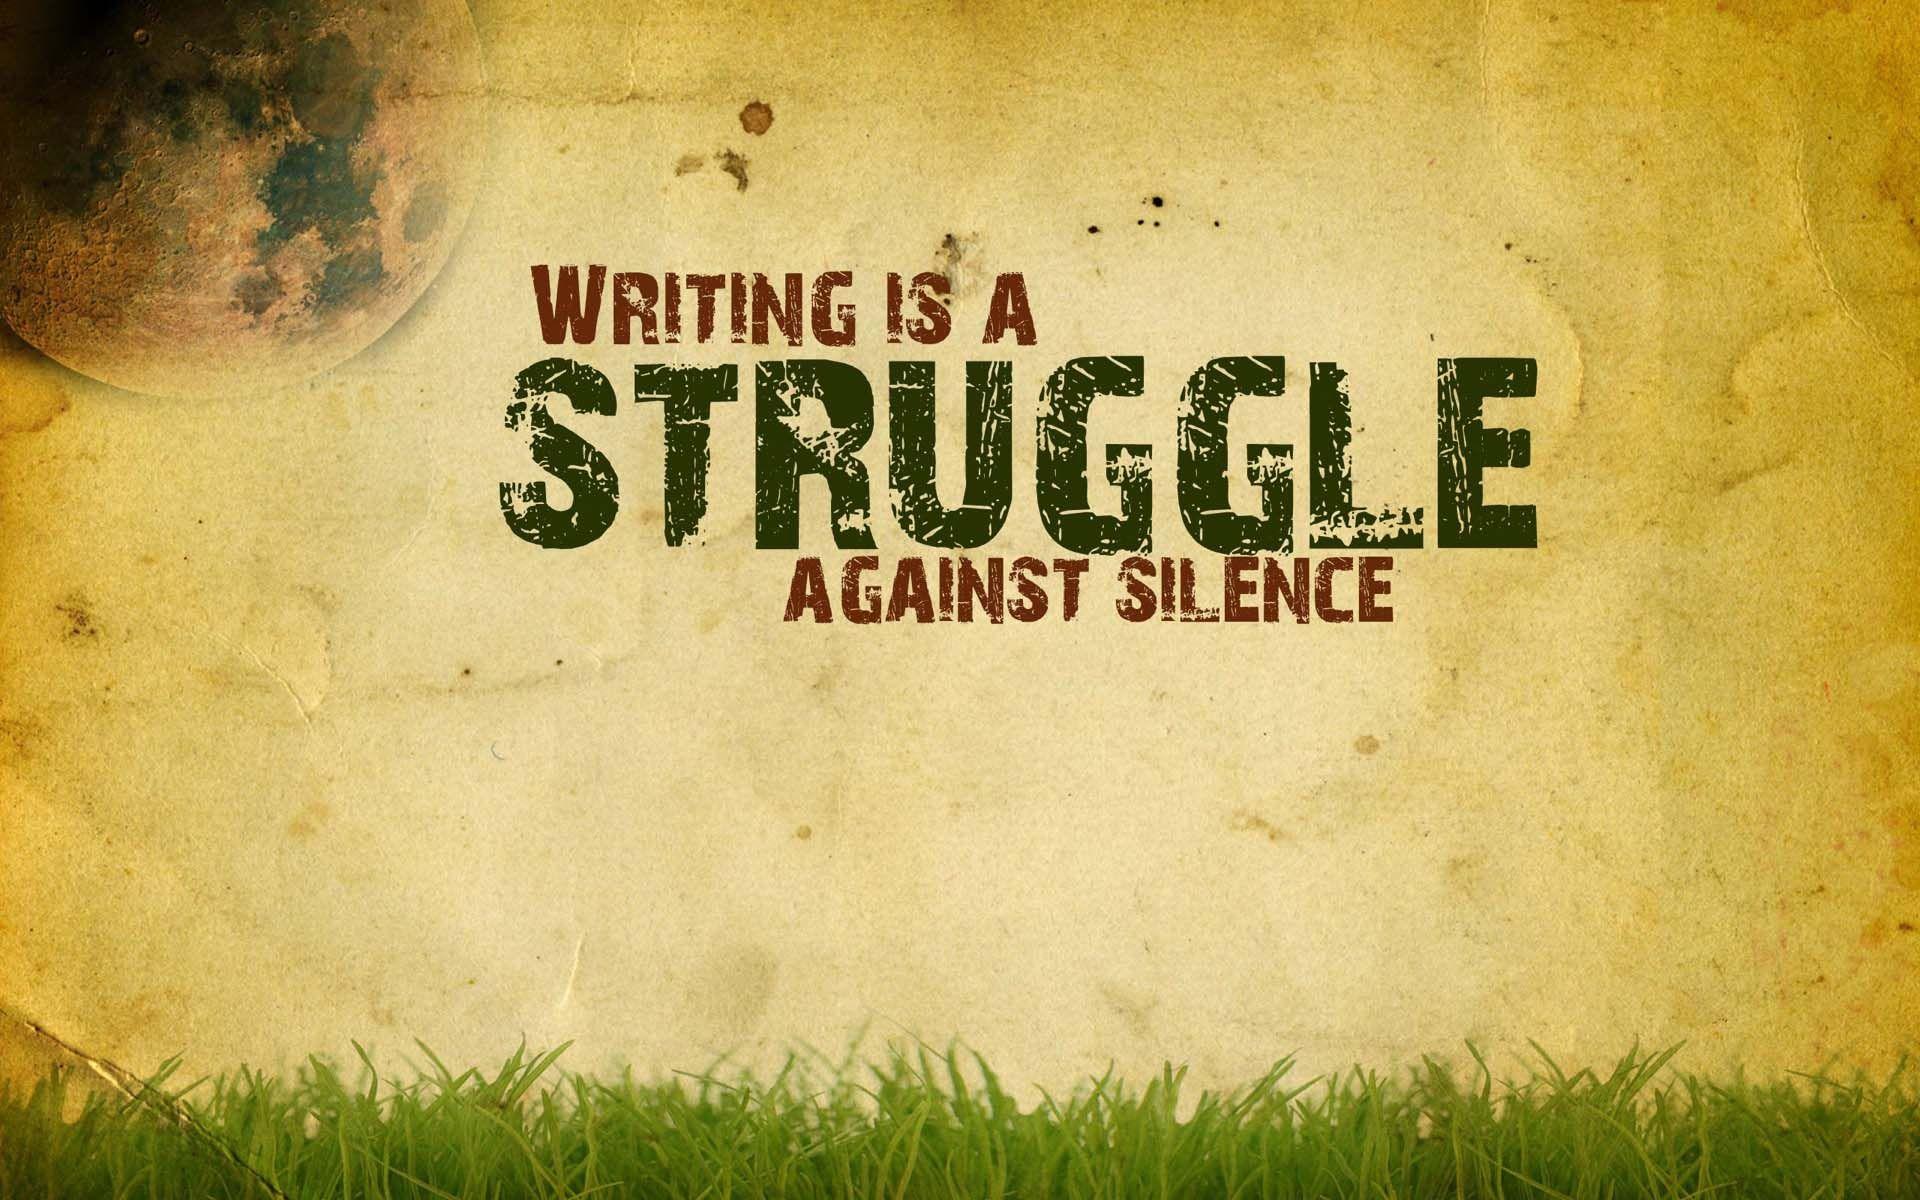 Struggle Inspirational Quotes Wallpaper - Write Wallpaper Hd - HD Wallpaper